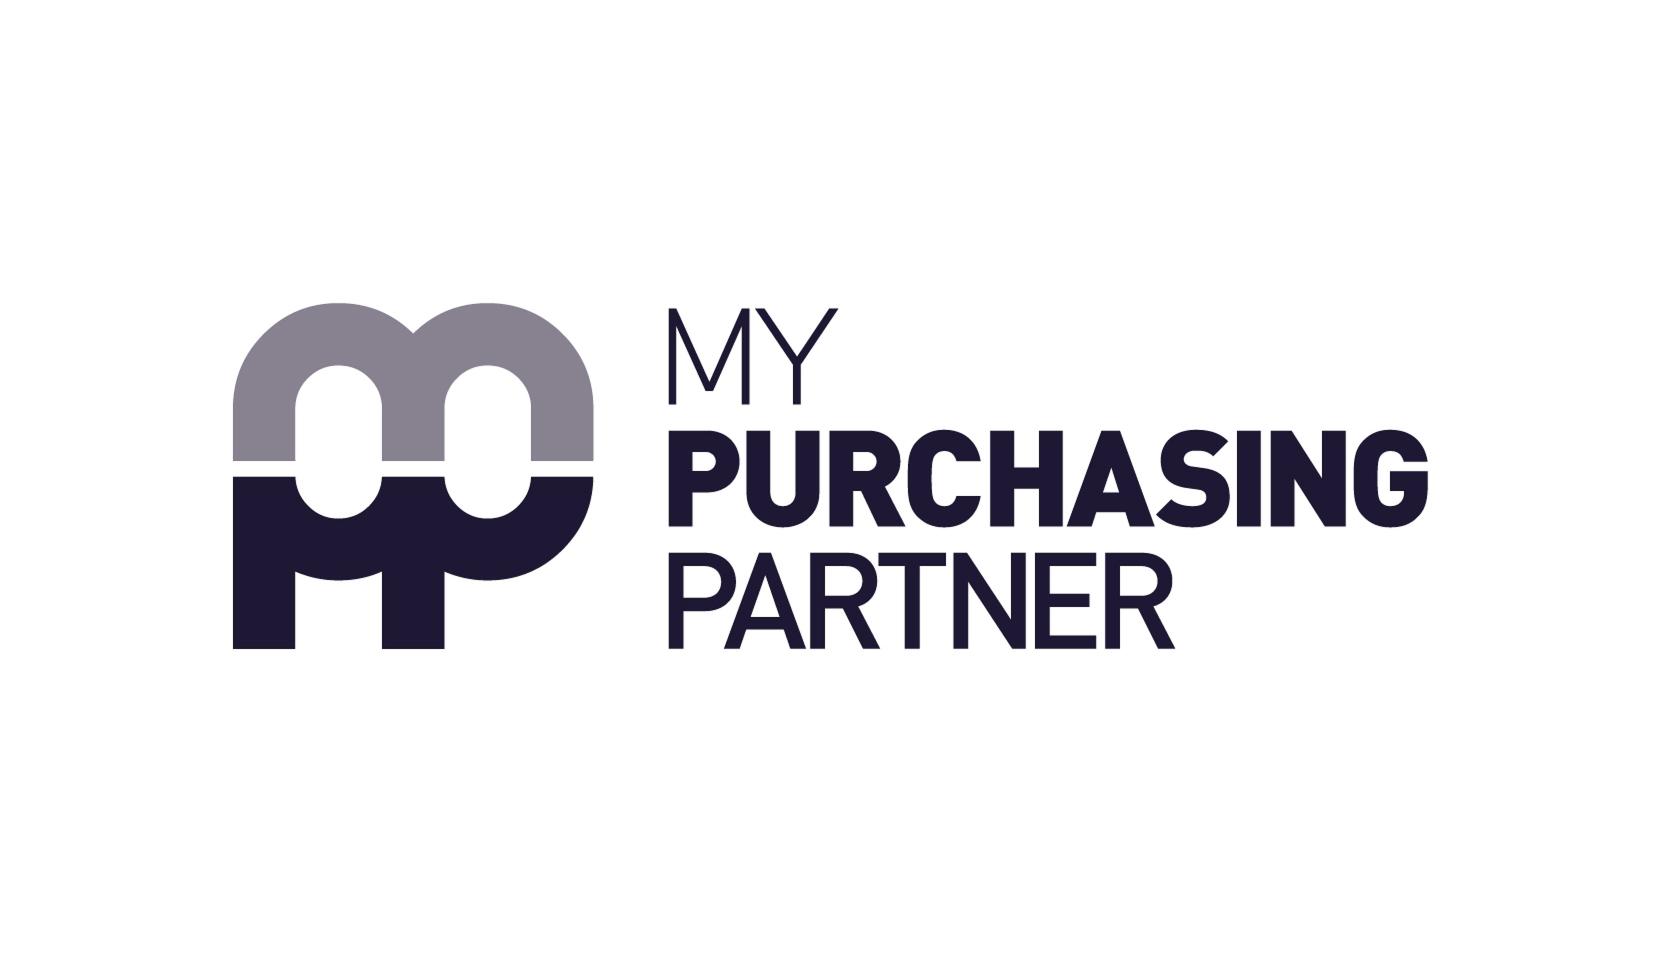 My Purchasing Partner